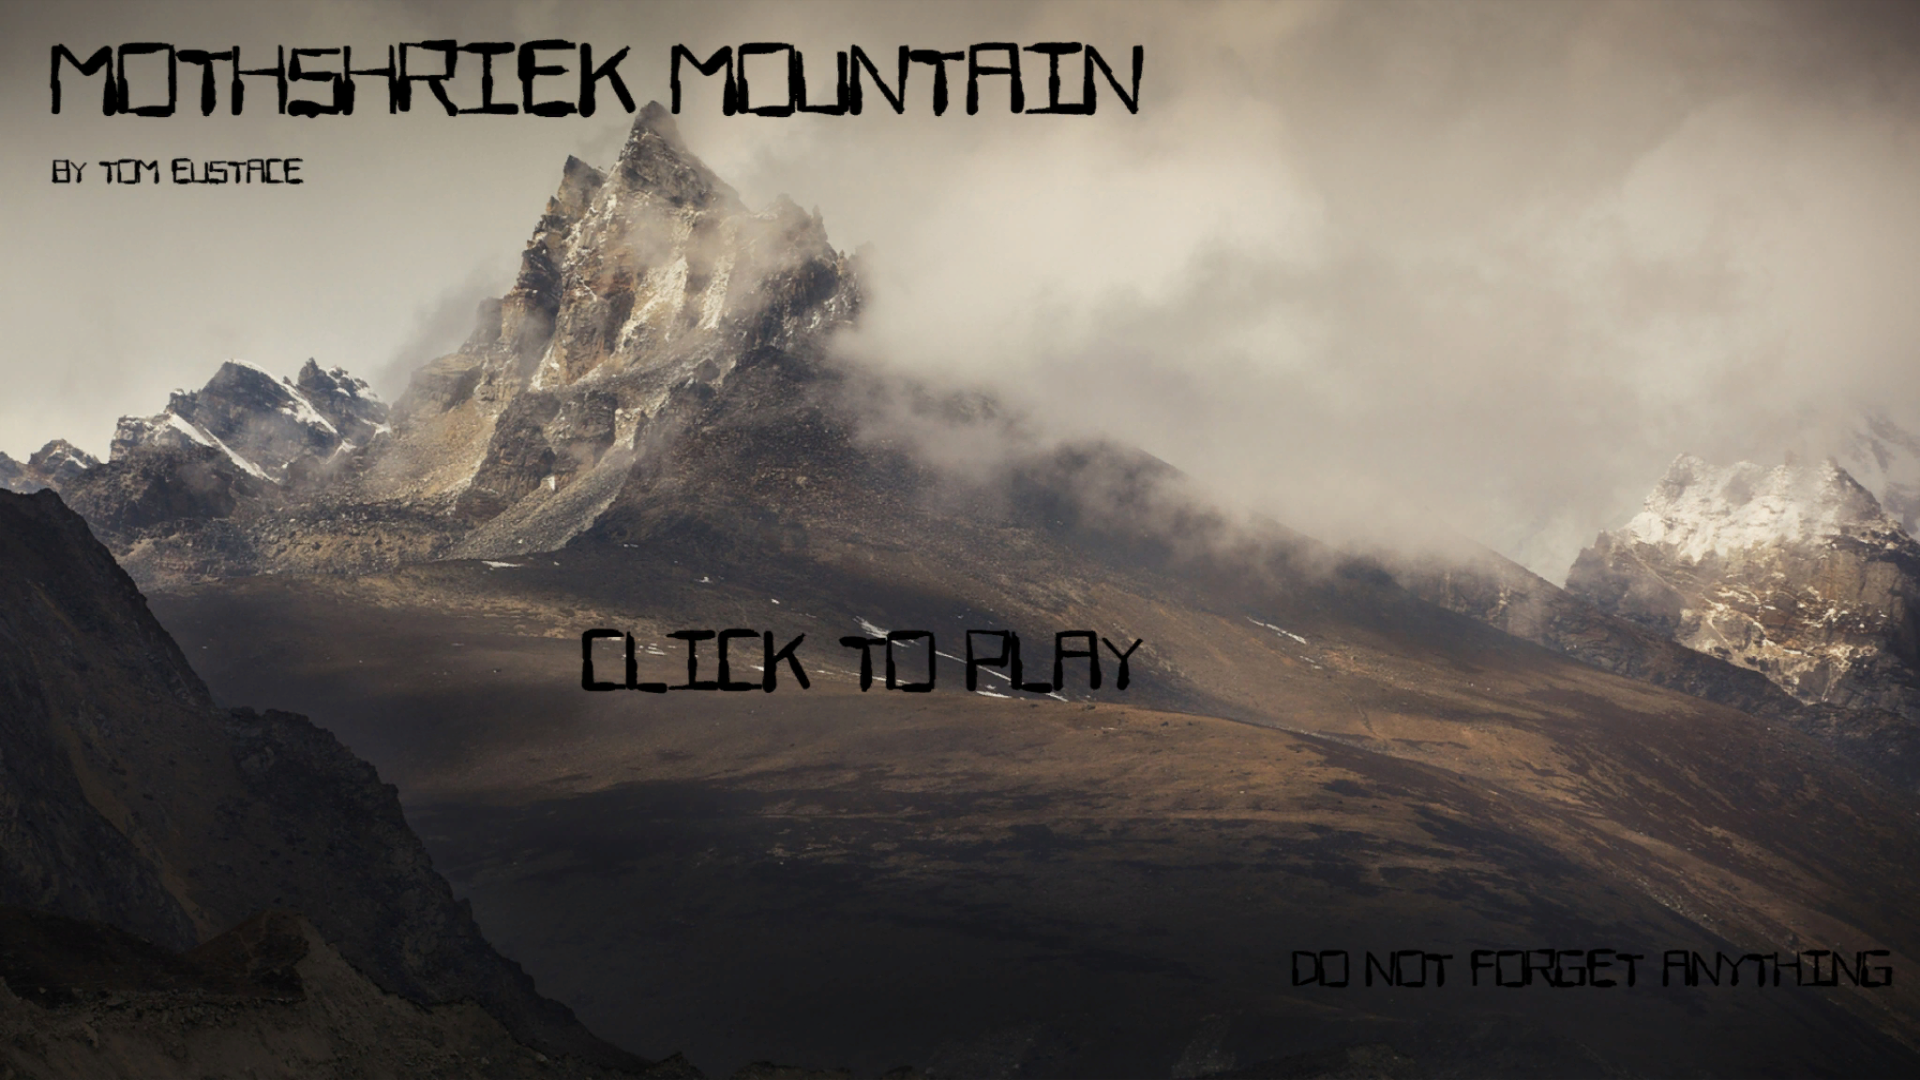 Mothshriek Mountain